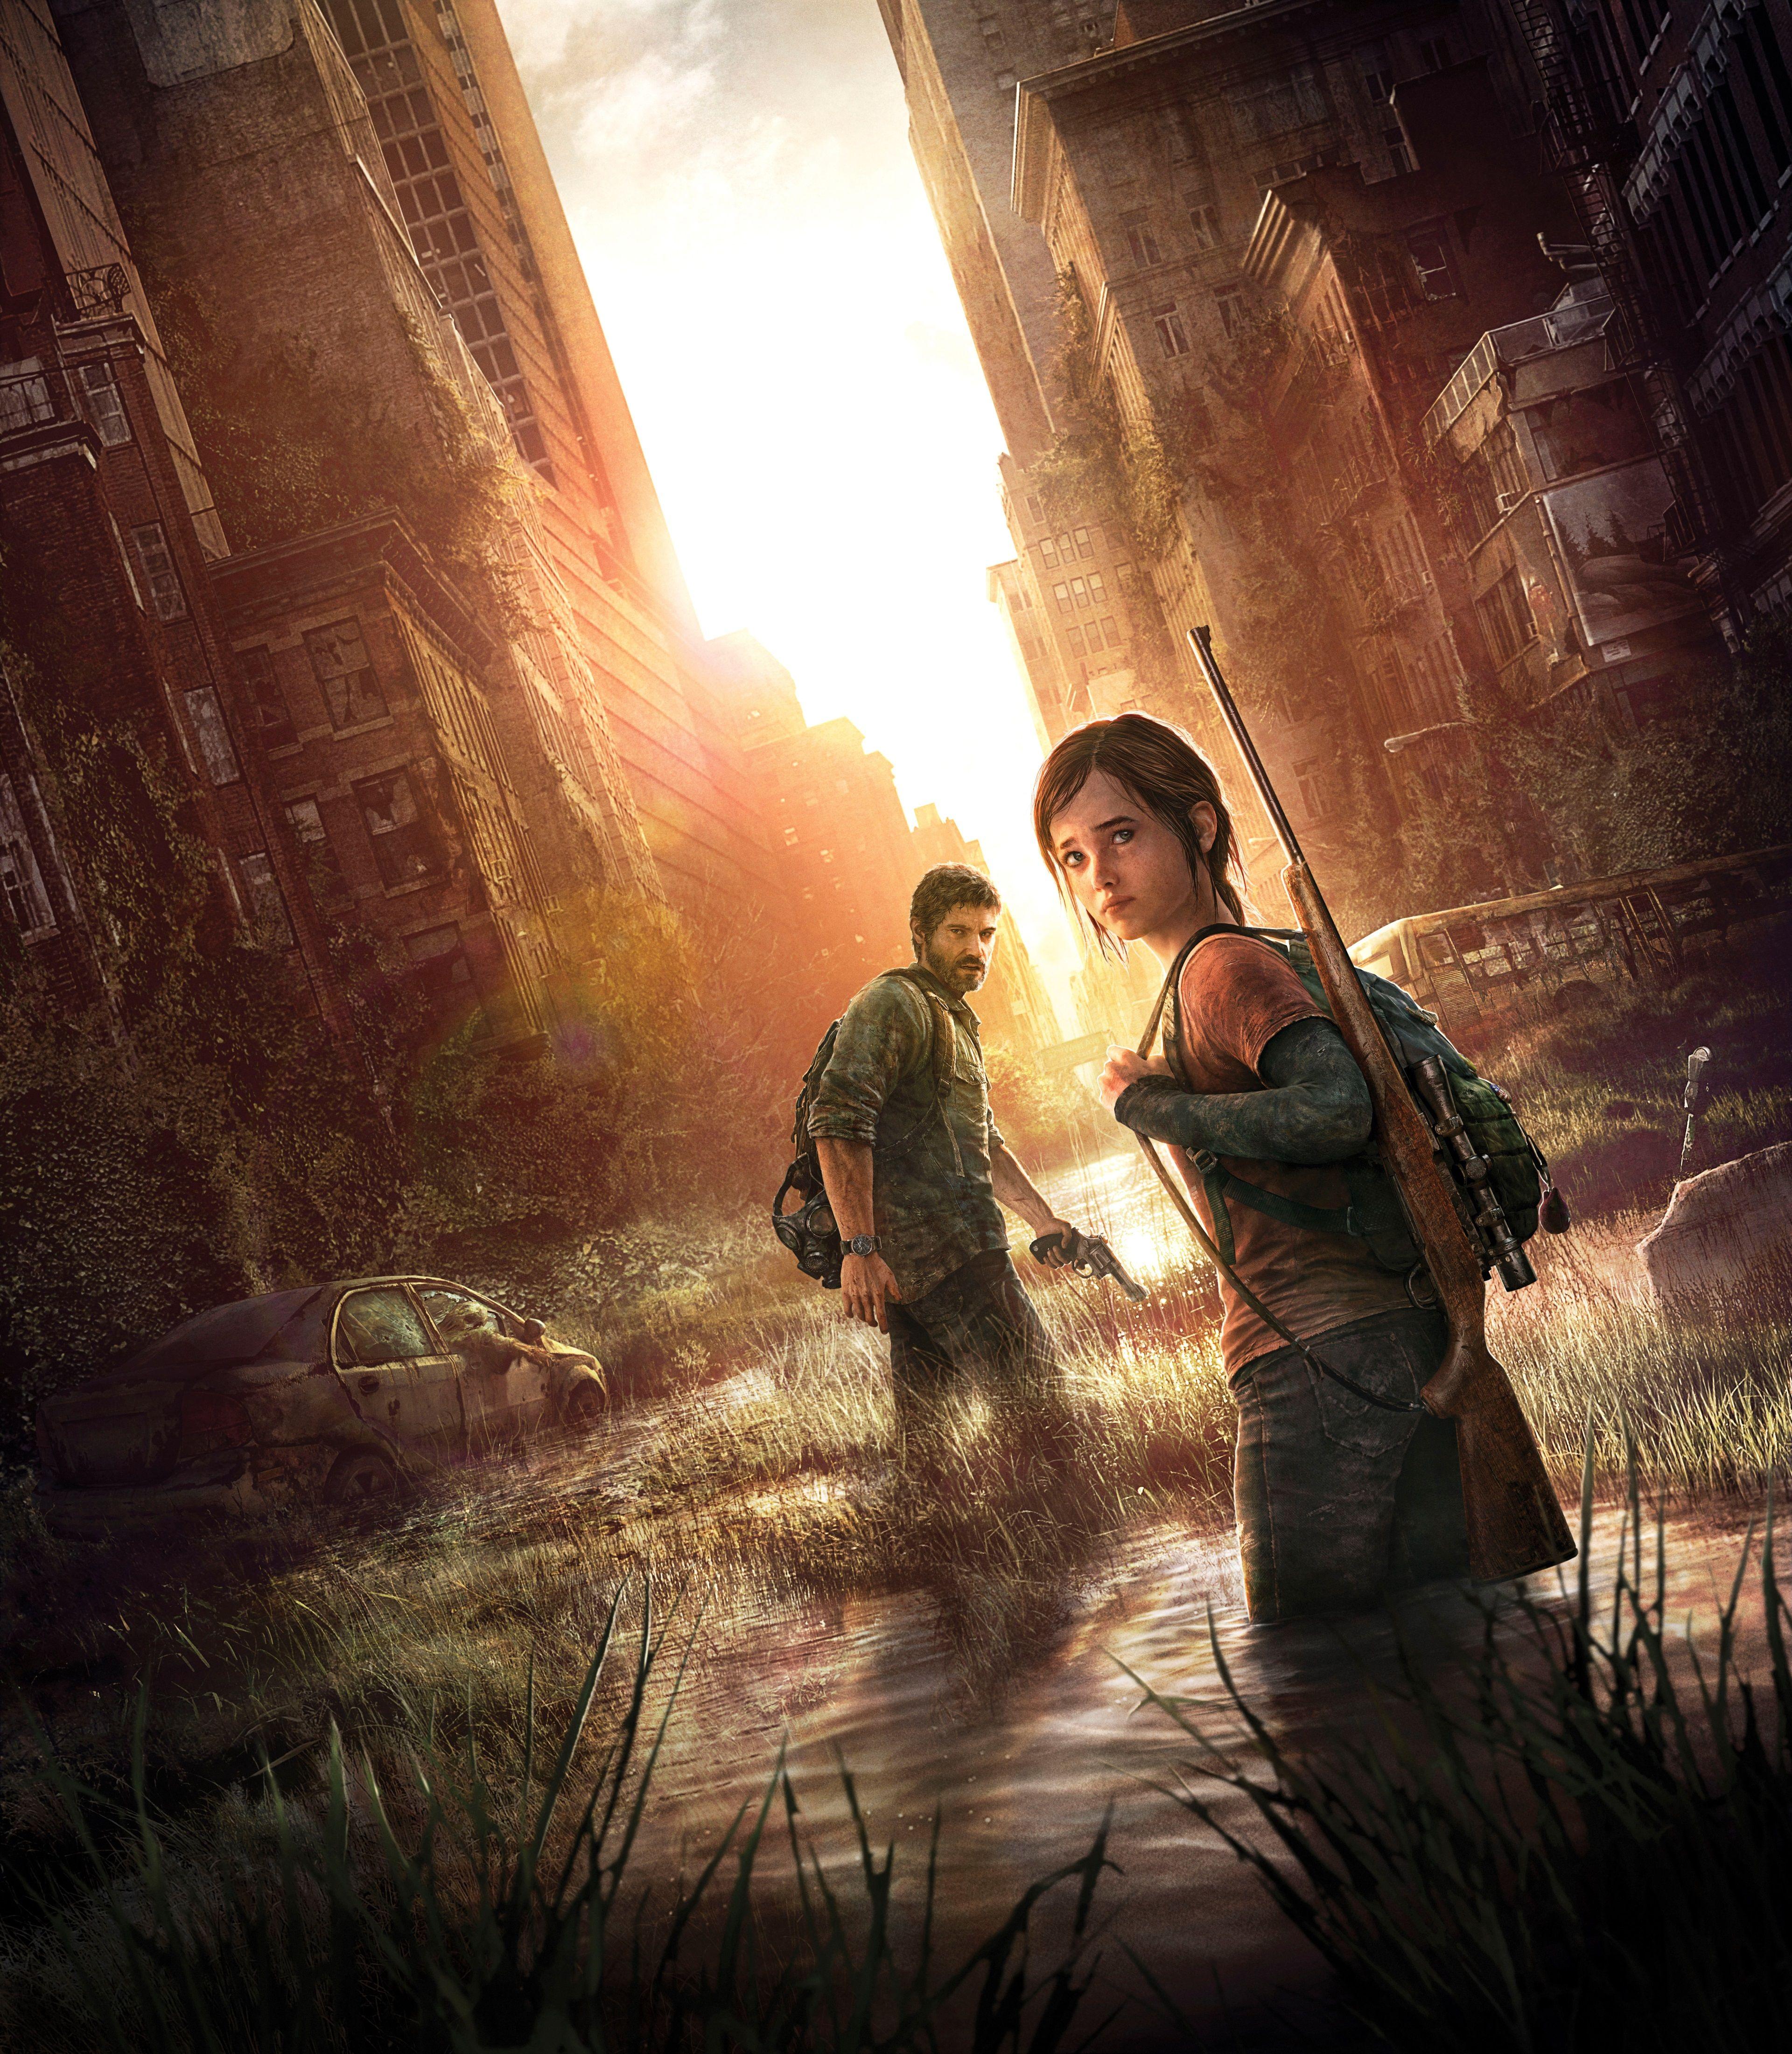 3840x4402 The Last Of Us 4k Desktops Wallpapers The Last Of Us The Last Of Us2 The Lest Of Us